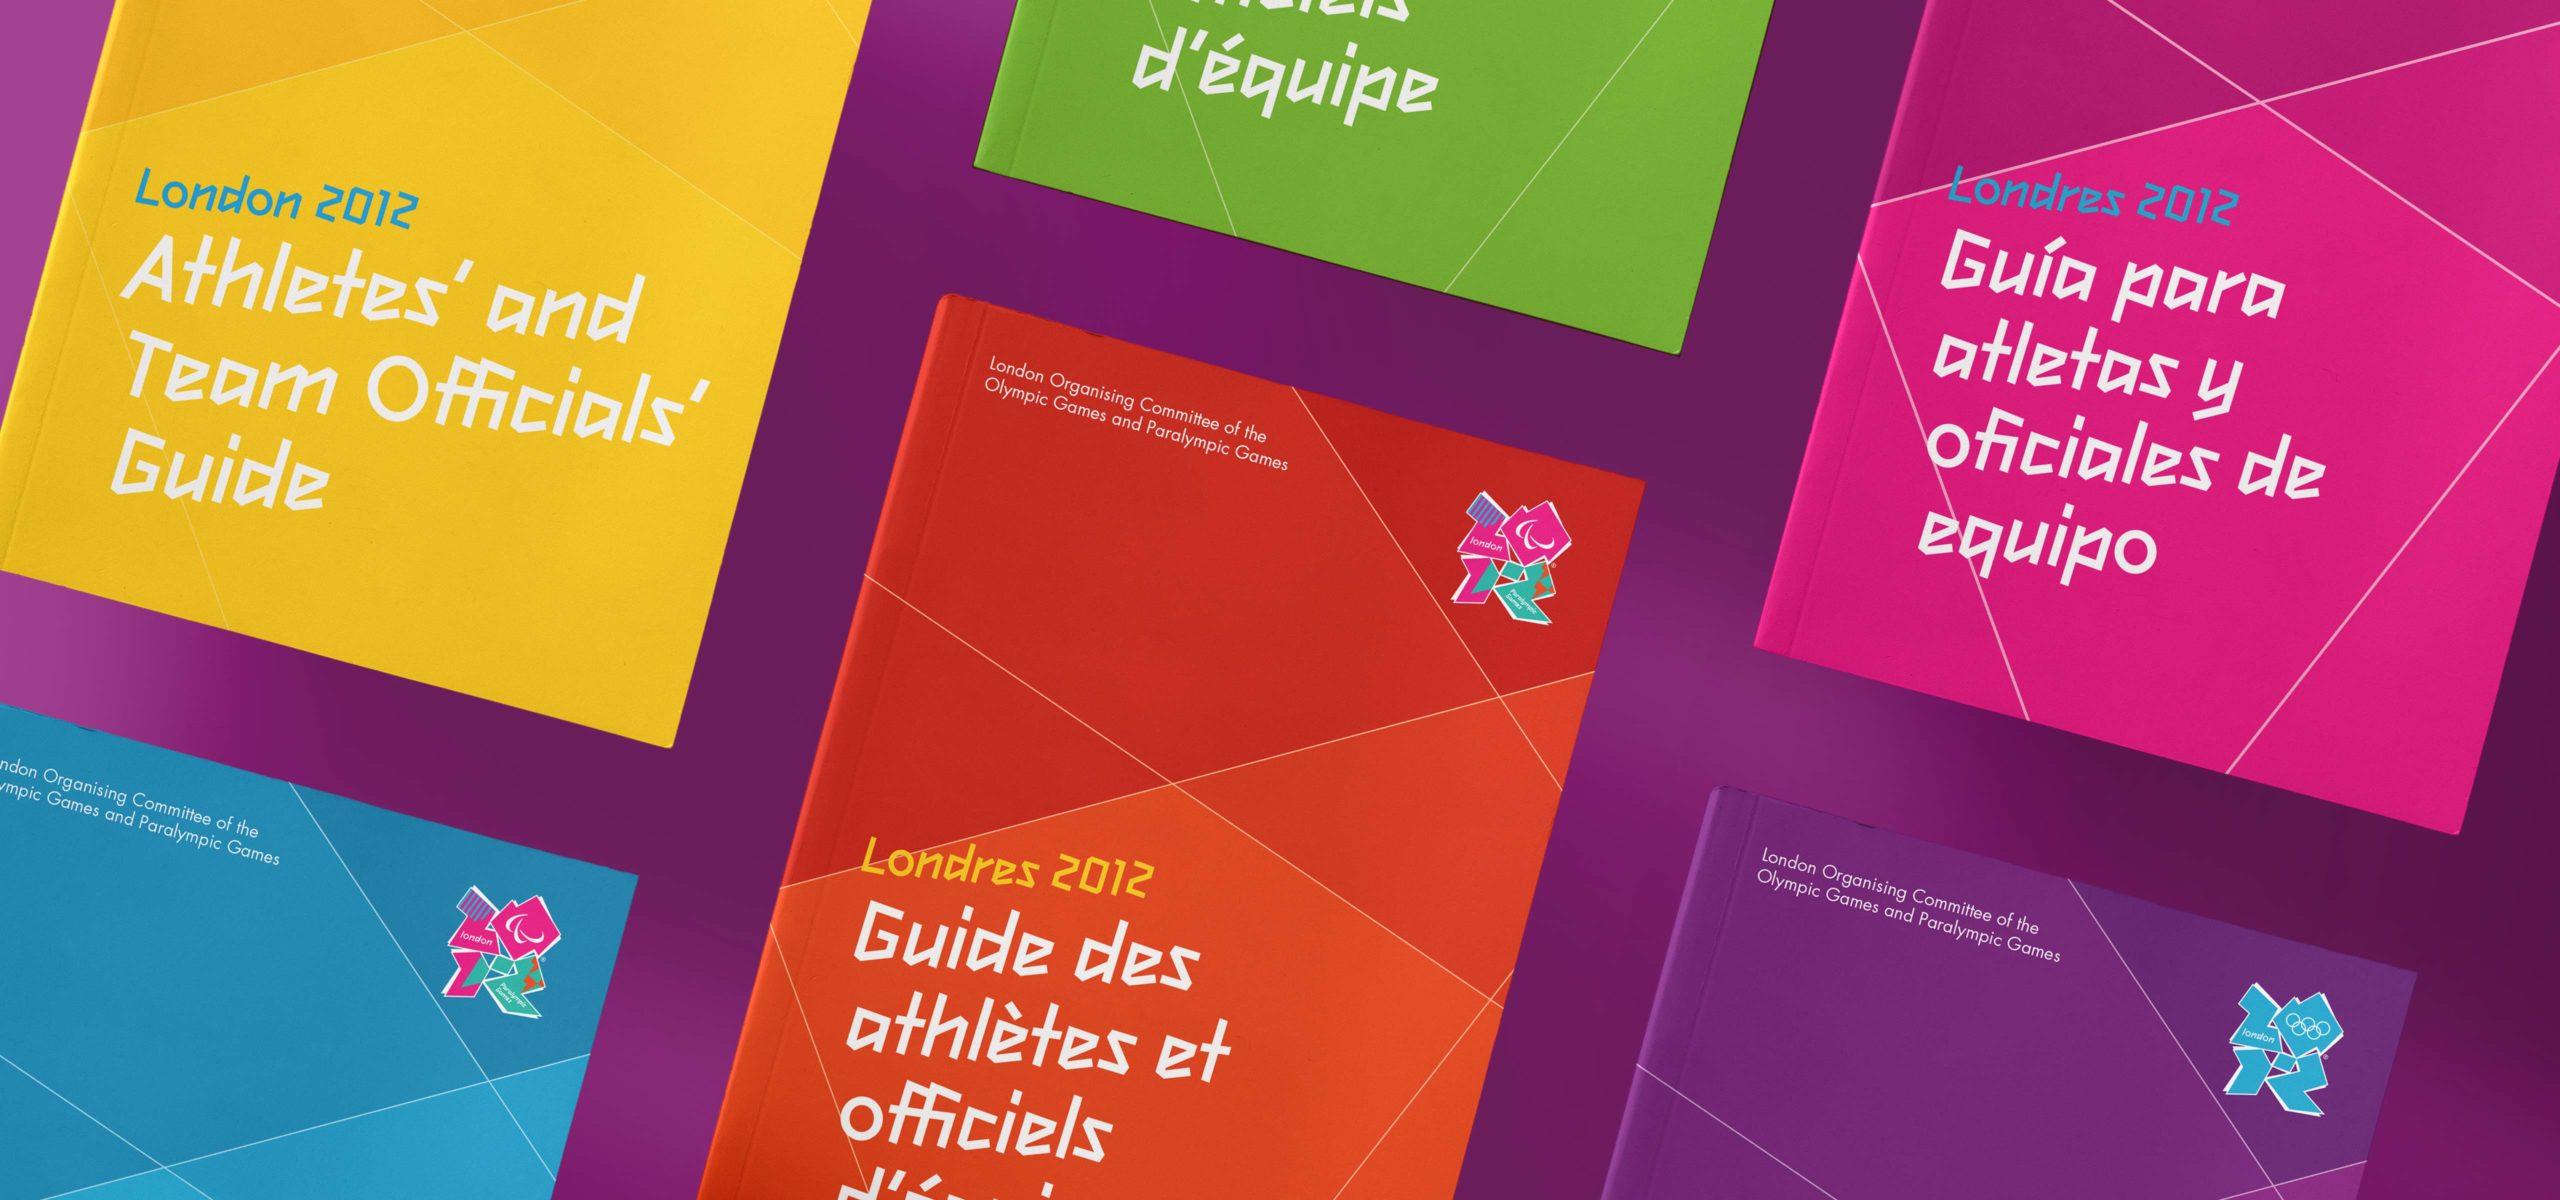 london-2012-guides